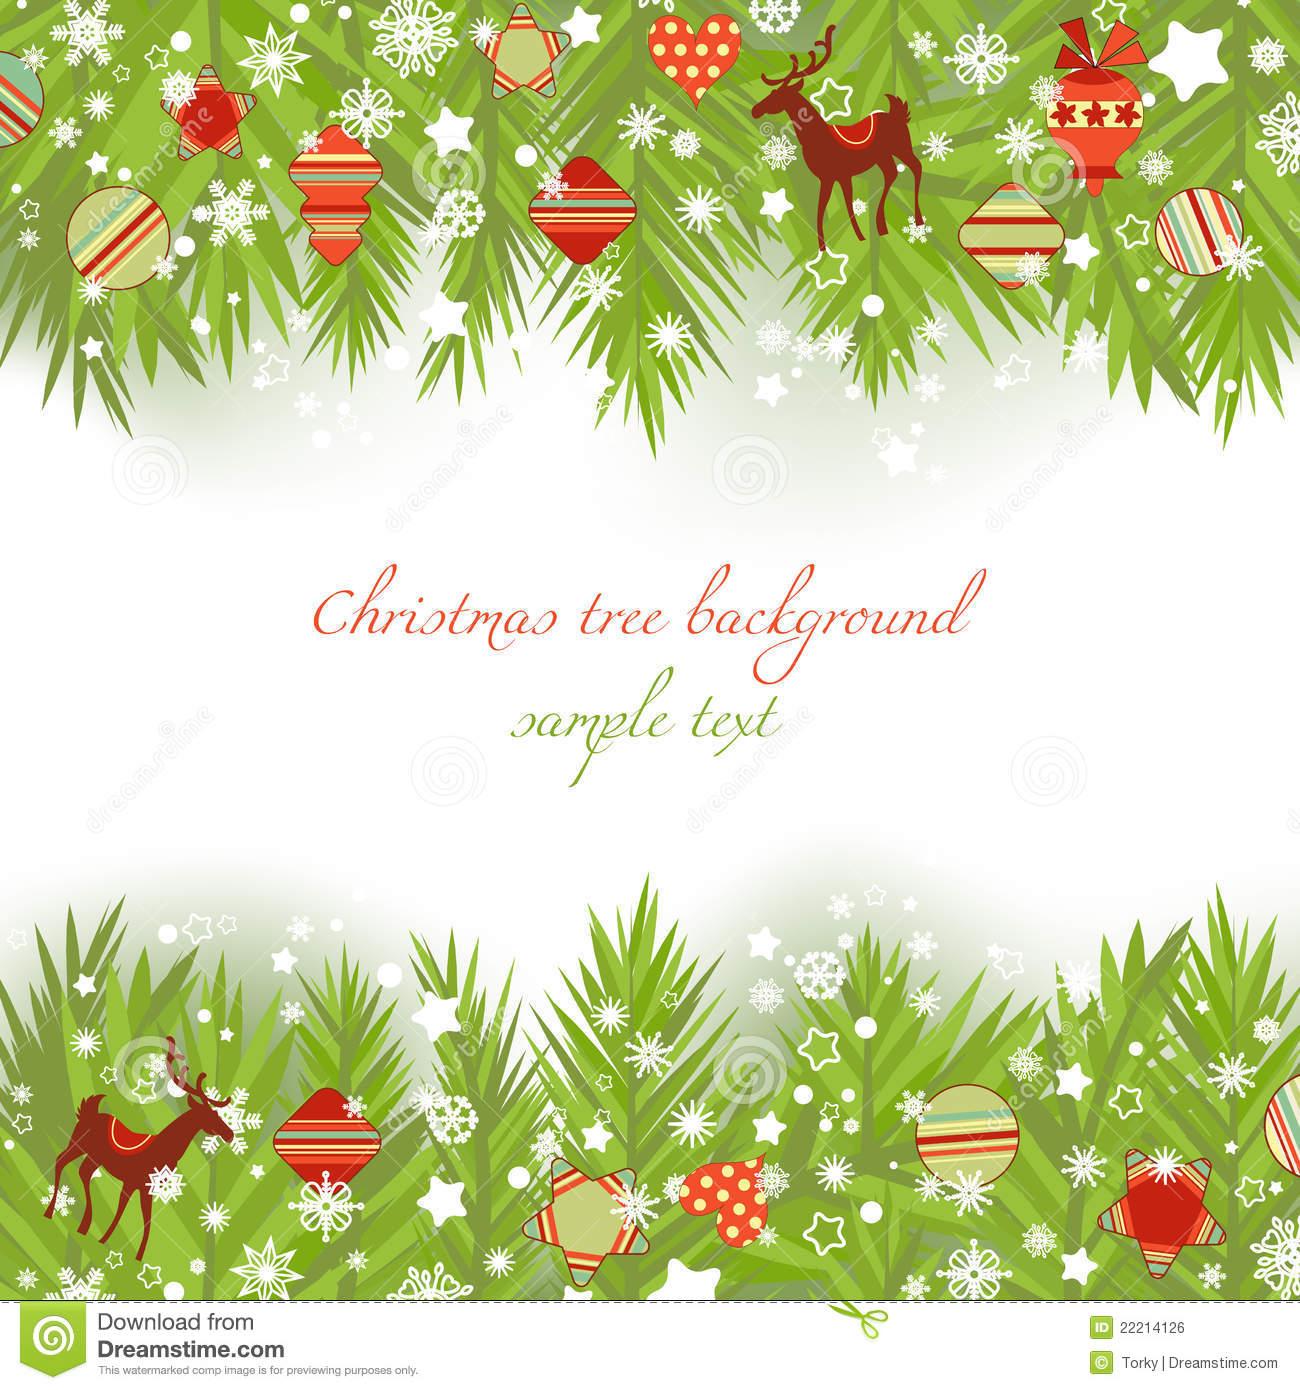 Christmas tree borders stock vector. Illustration of festive.